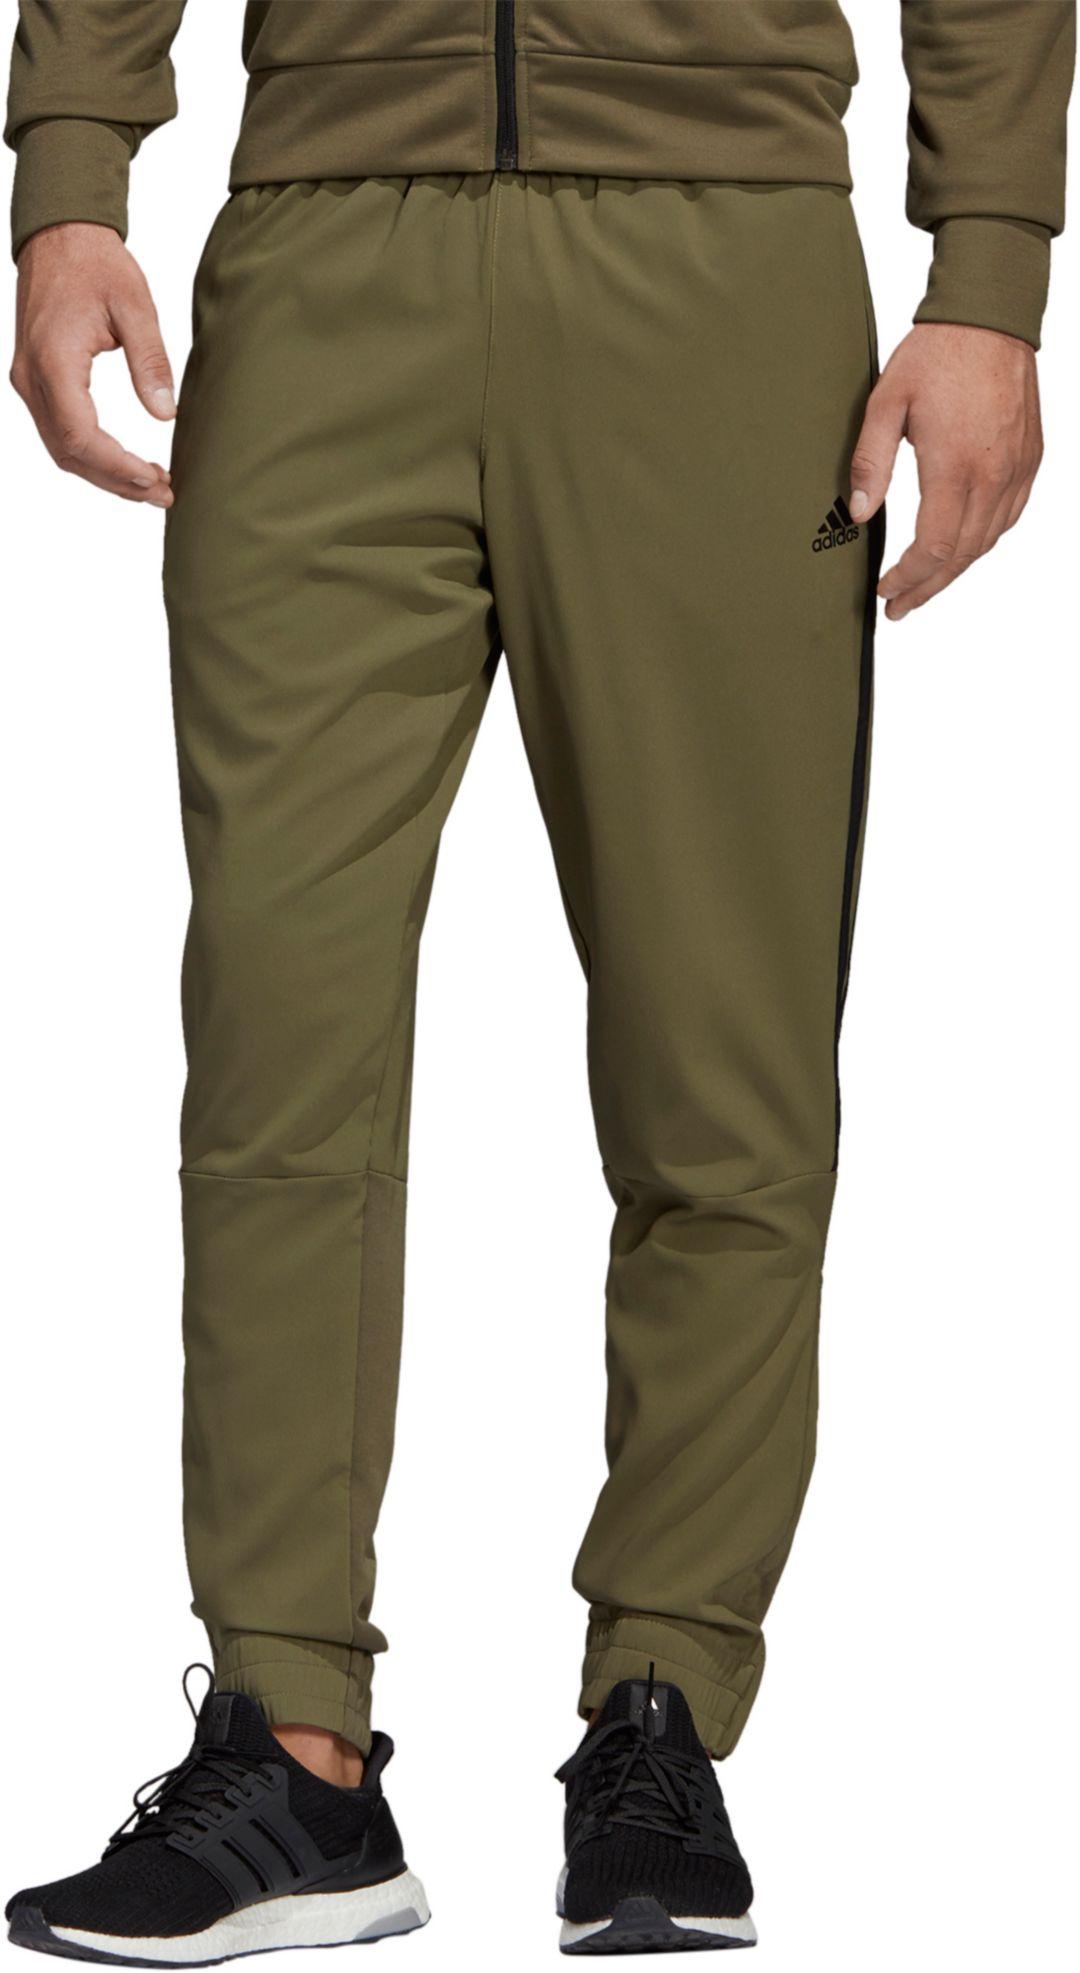 25ea8e08 adidas Men's Sport ID Tiro Woven Pants | DICK'S Sporting Goods